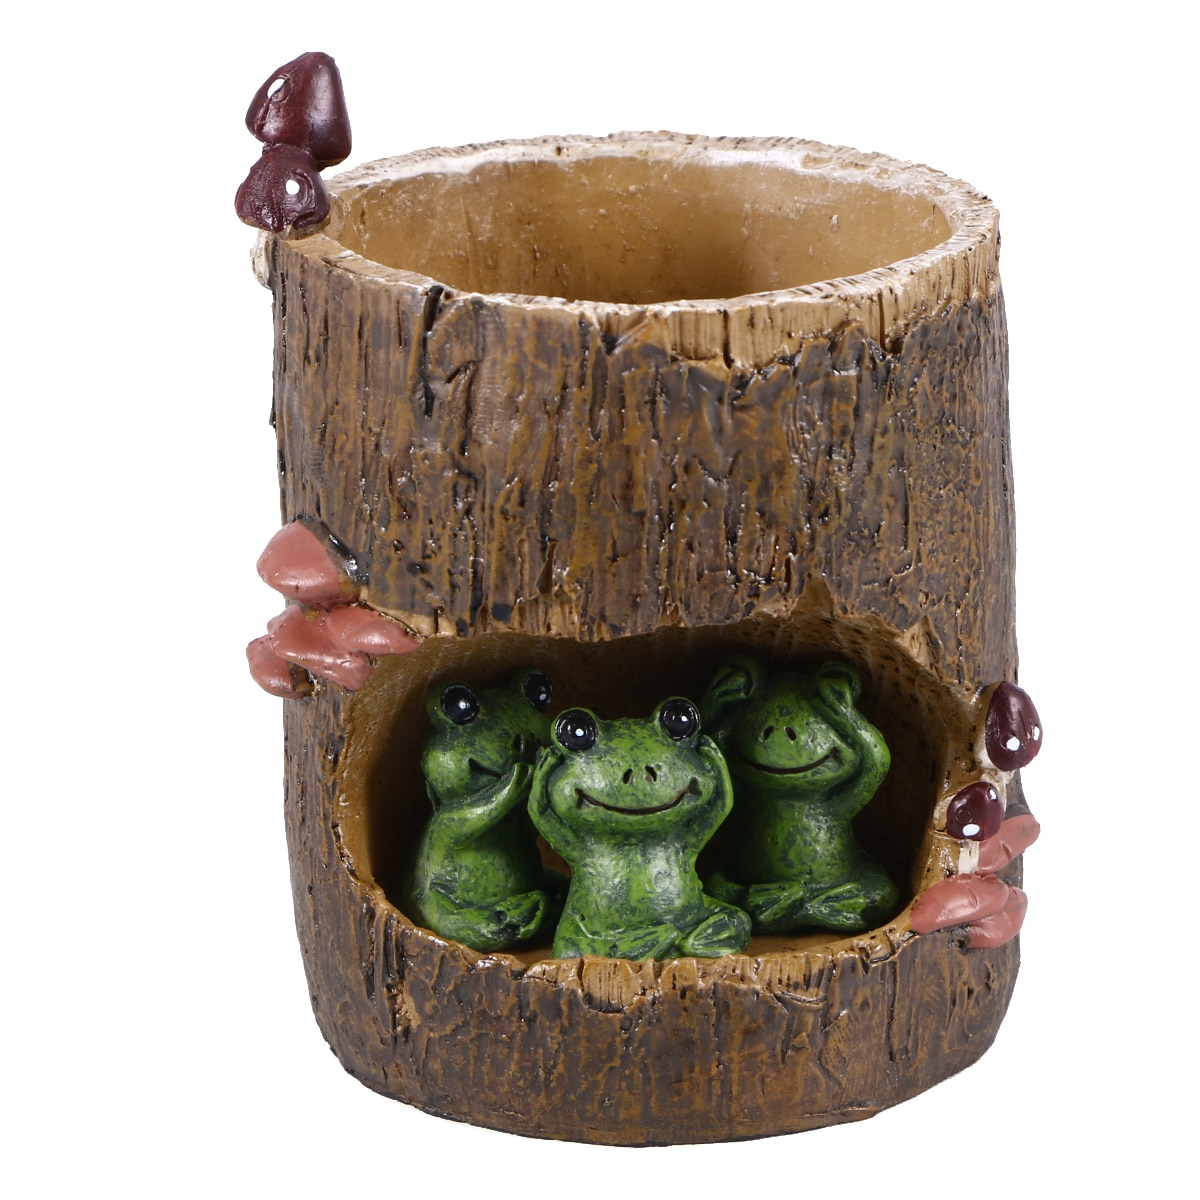 Linda rana verde flor sedón suculenta maceta Bonsai maceta caja lecho de planta Oficina maceta para jardín de casa decoración oso conejo